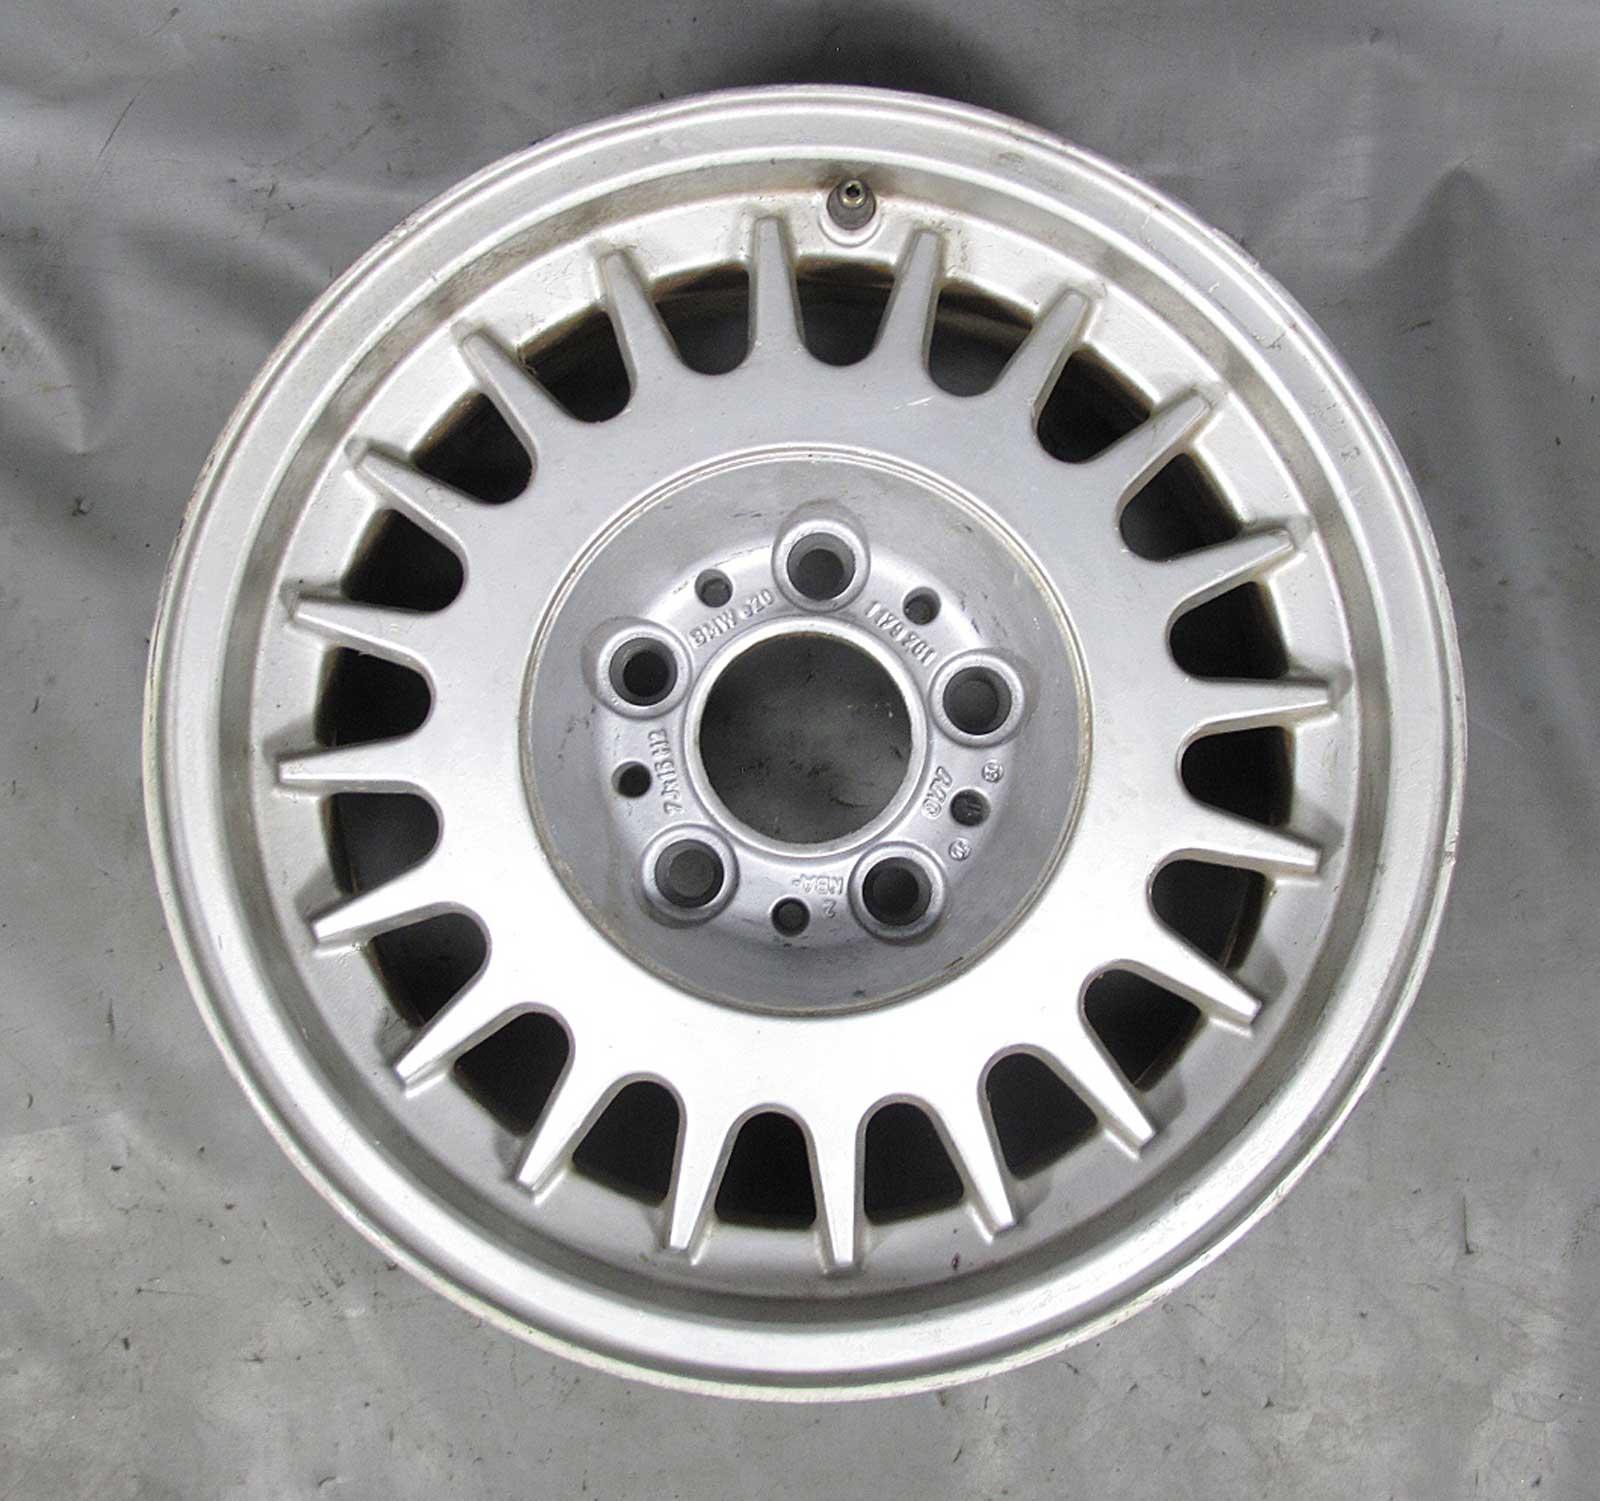 rim inch m alloy sport front bmw style details wheels wheel styles